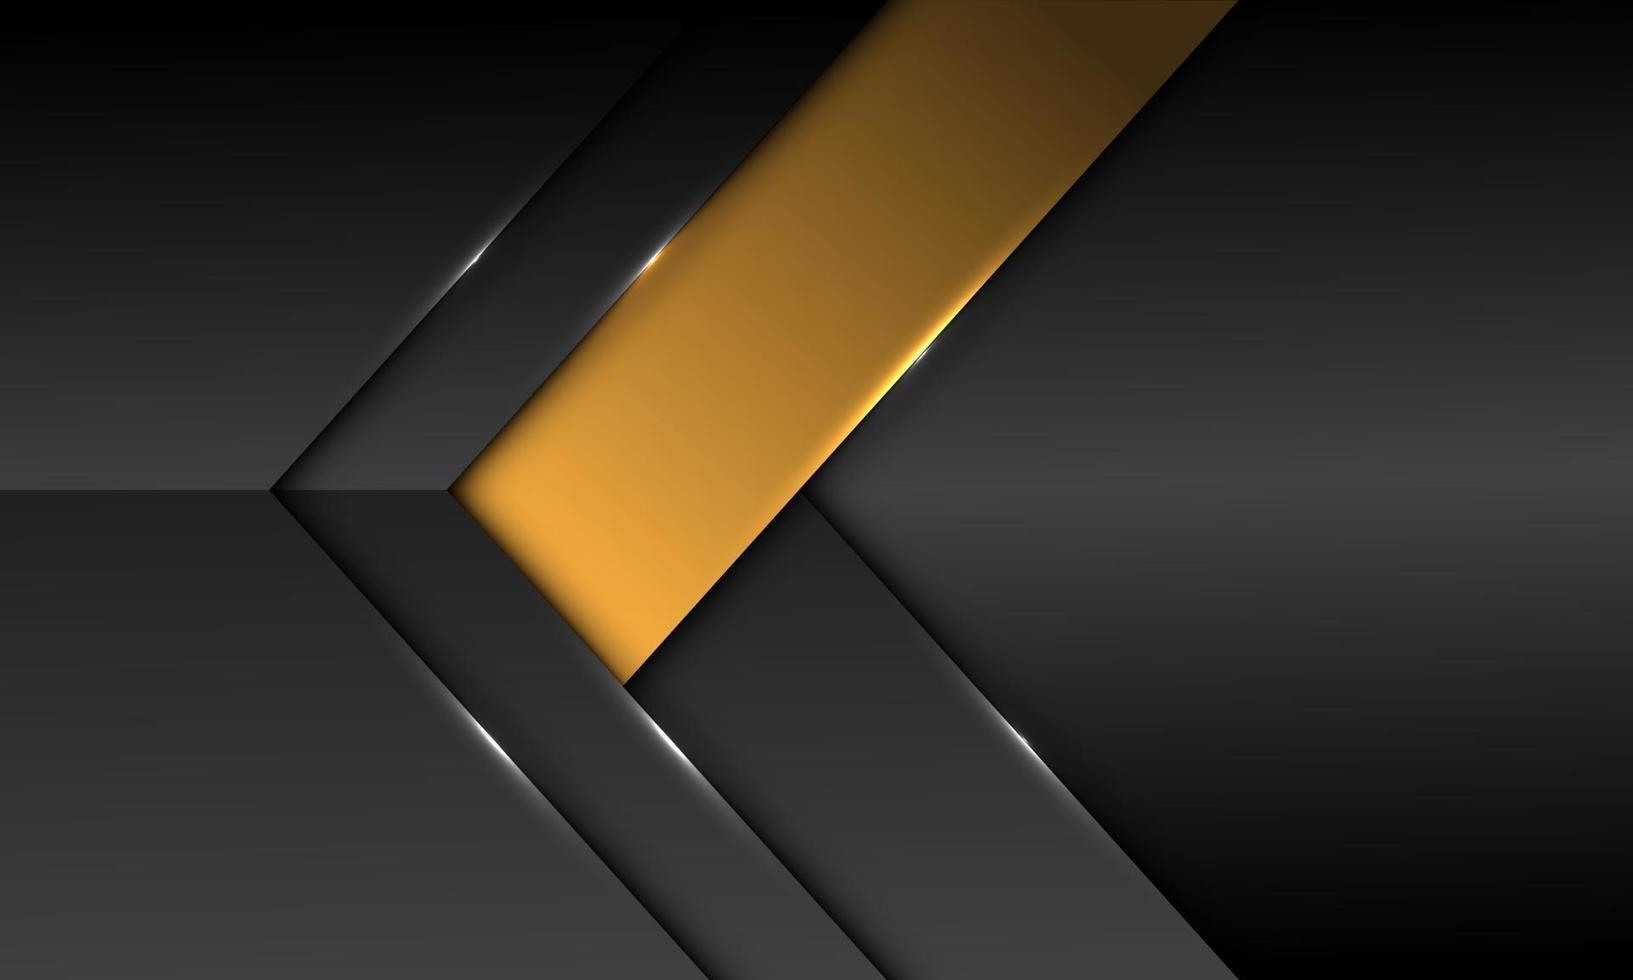 Dirección de flecha de banner amarillo metálico gris oscuro abstracto con diseño de espacio en blanco moderno fondo futurista ilustración vectorial. vector